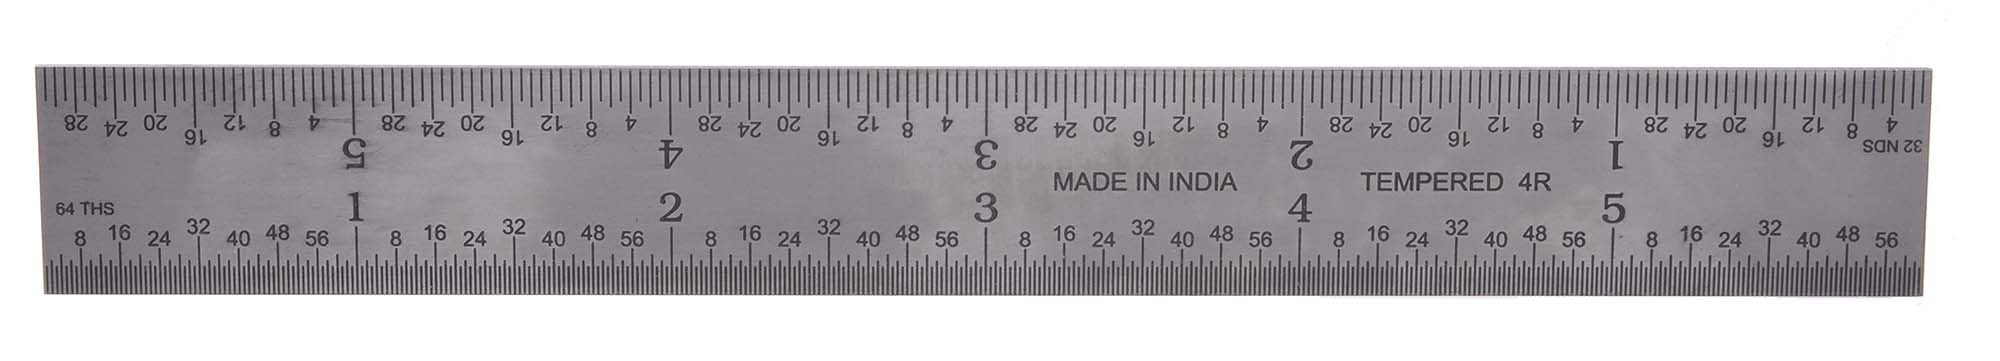 "RULF-12-4R   12"" 4R Flexible Steel Rule  - reads 32nds, 64ths, 8ths, 16ths."